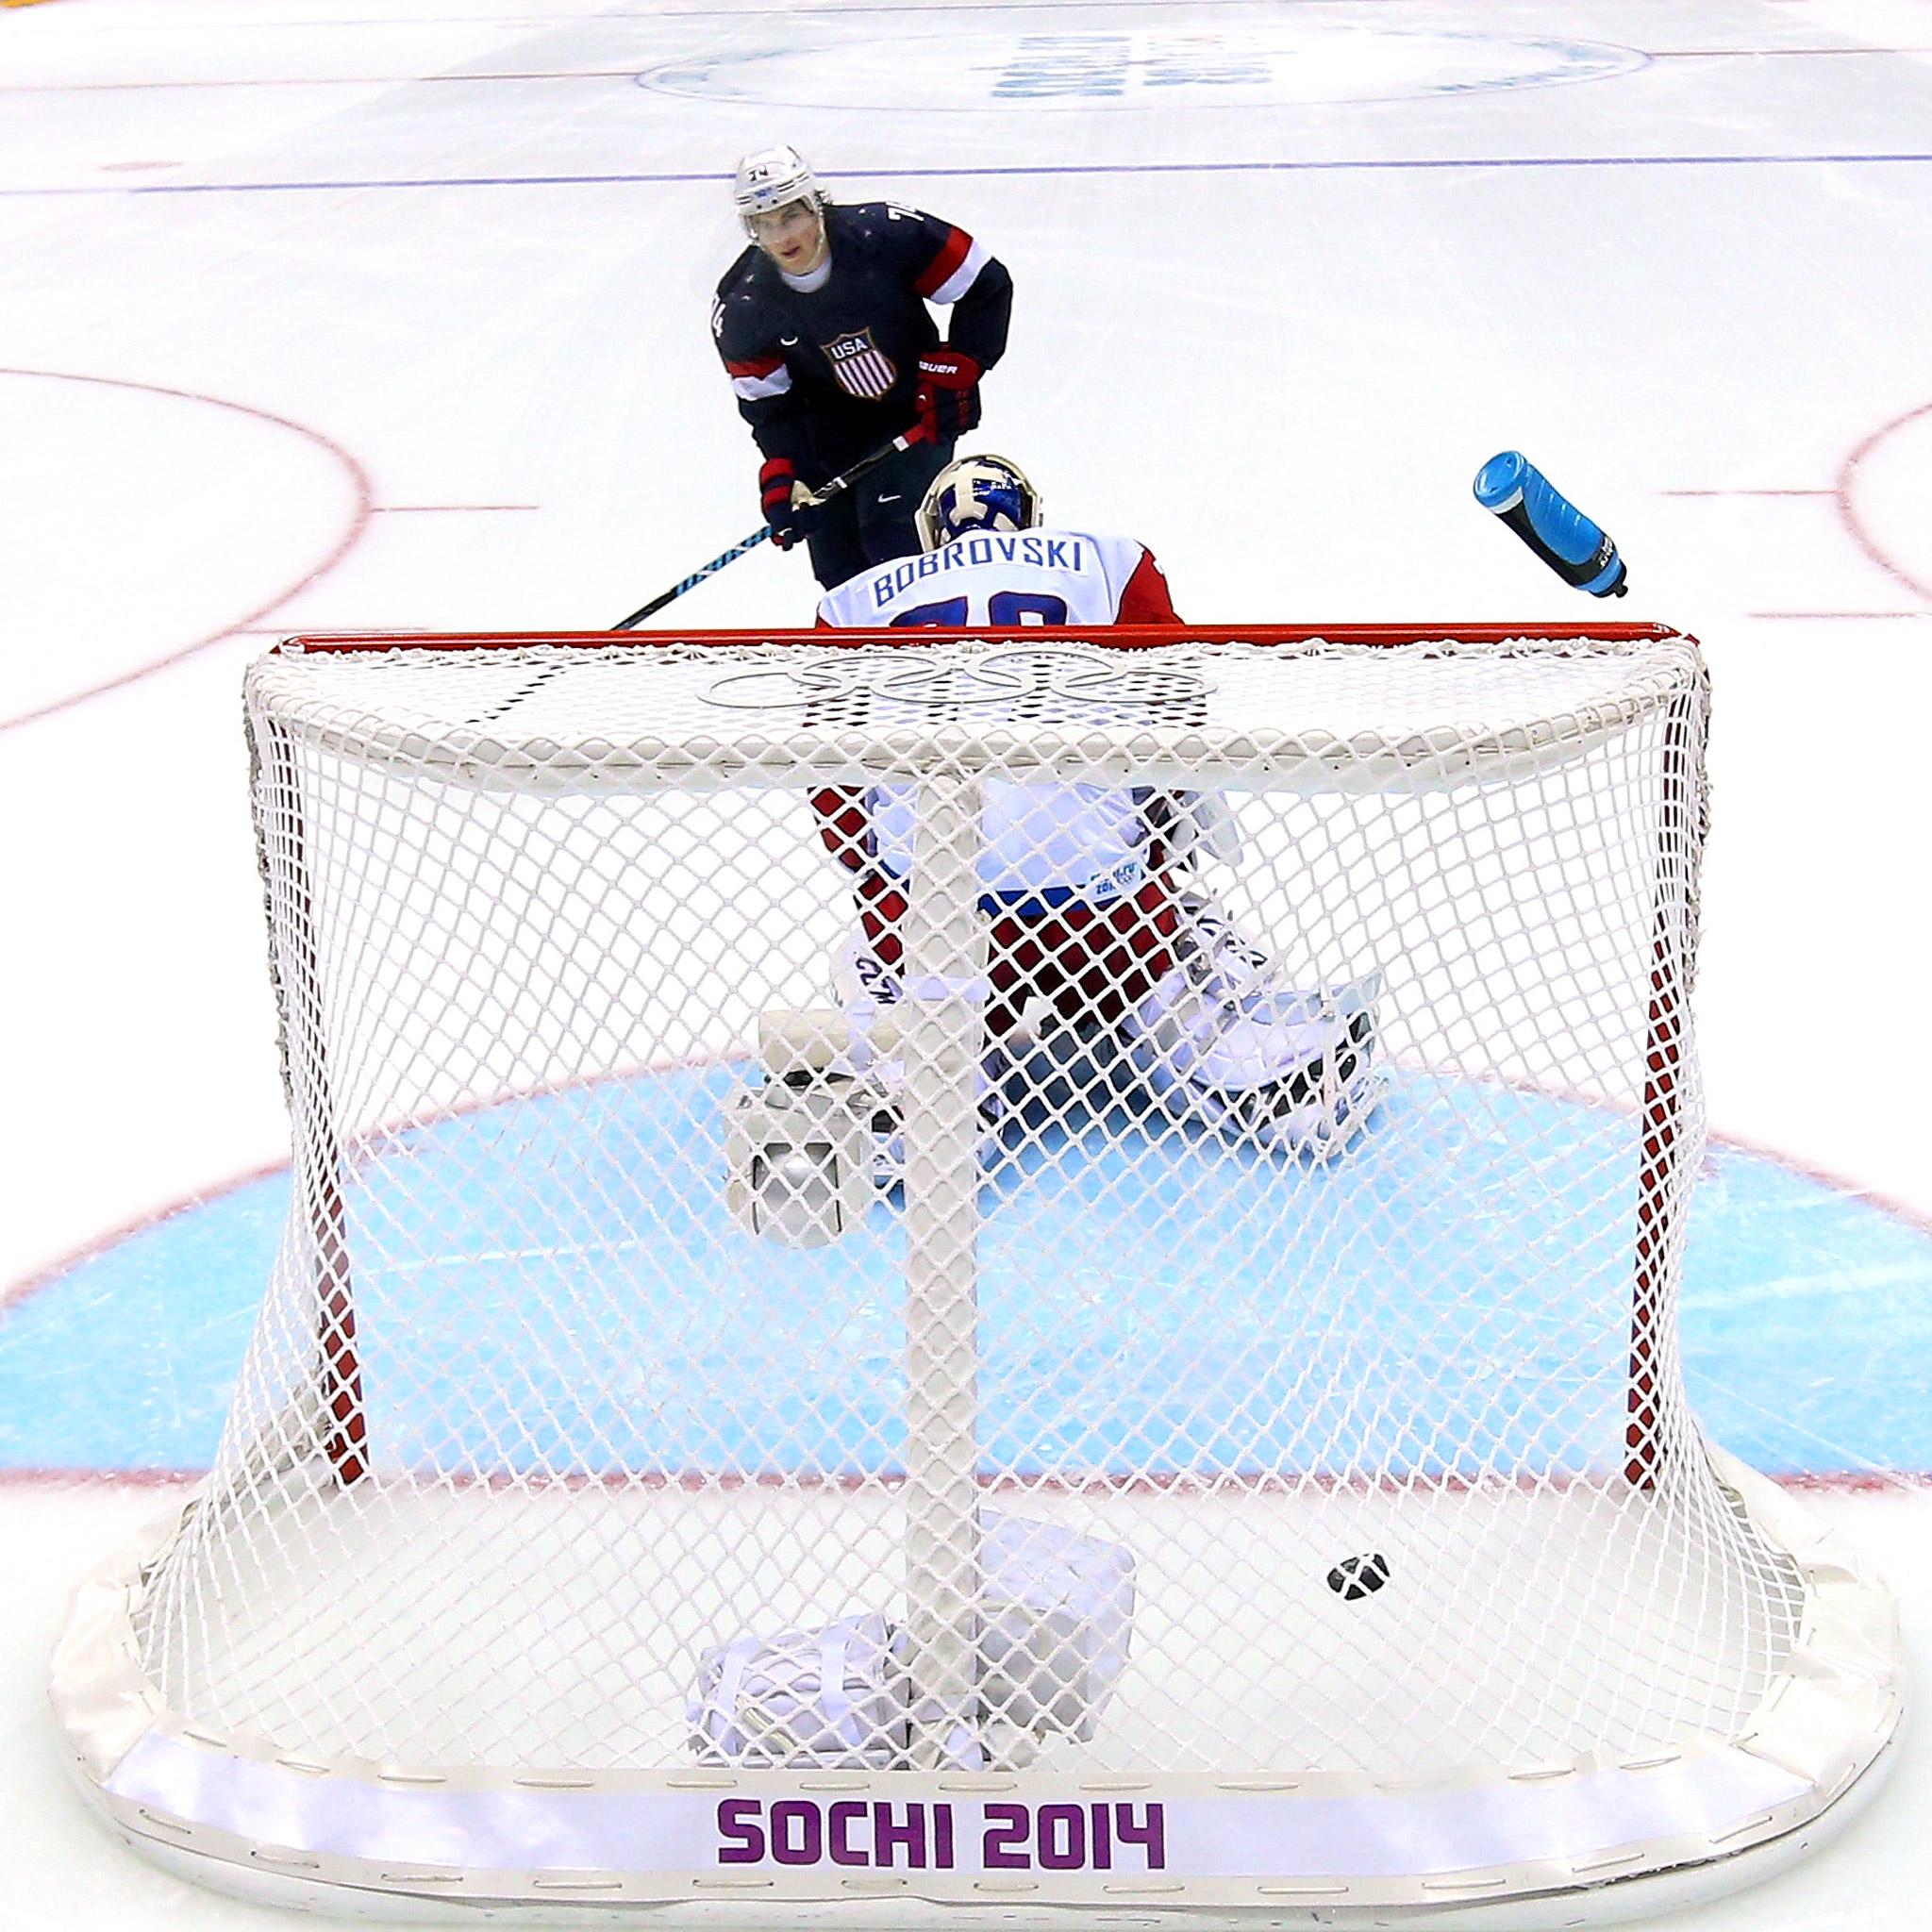 Oshie in Sochi